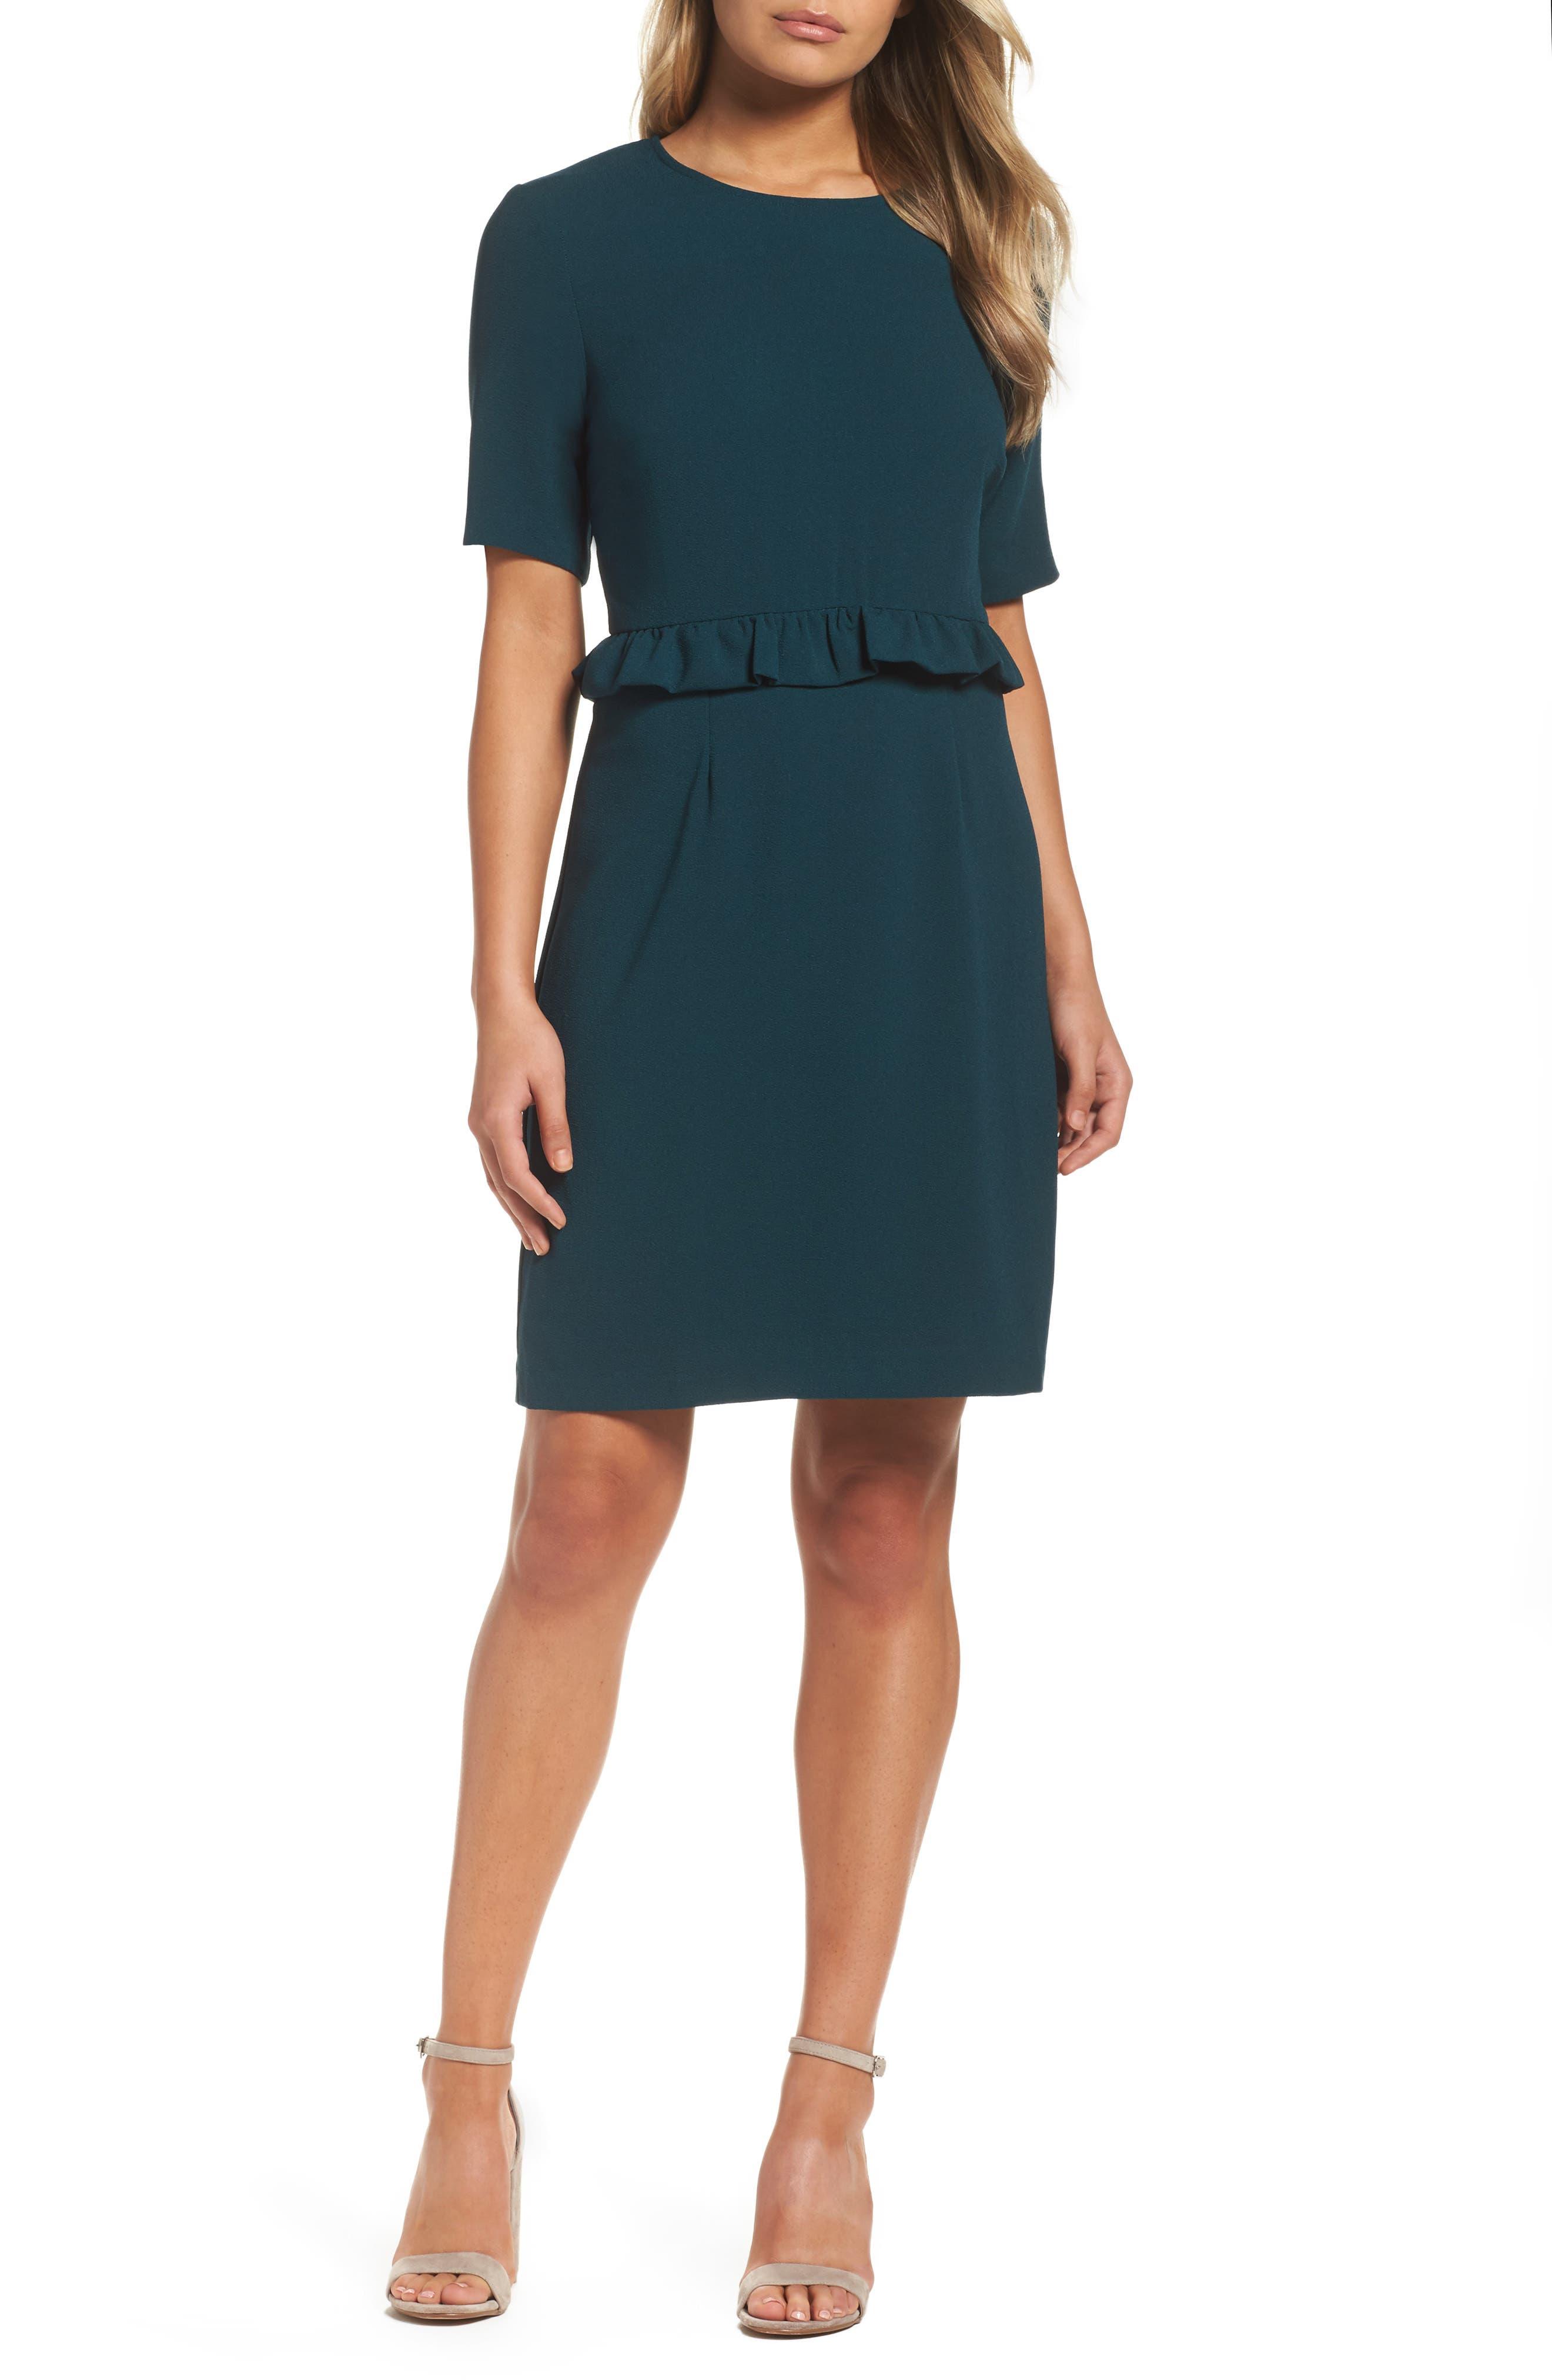 Alternate Image 1 Selected - Charles Henry Ruffle Crepe Sheath Dress